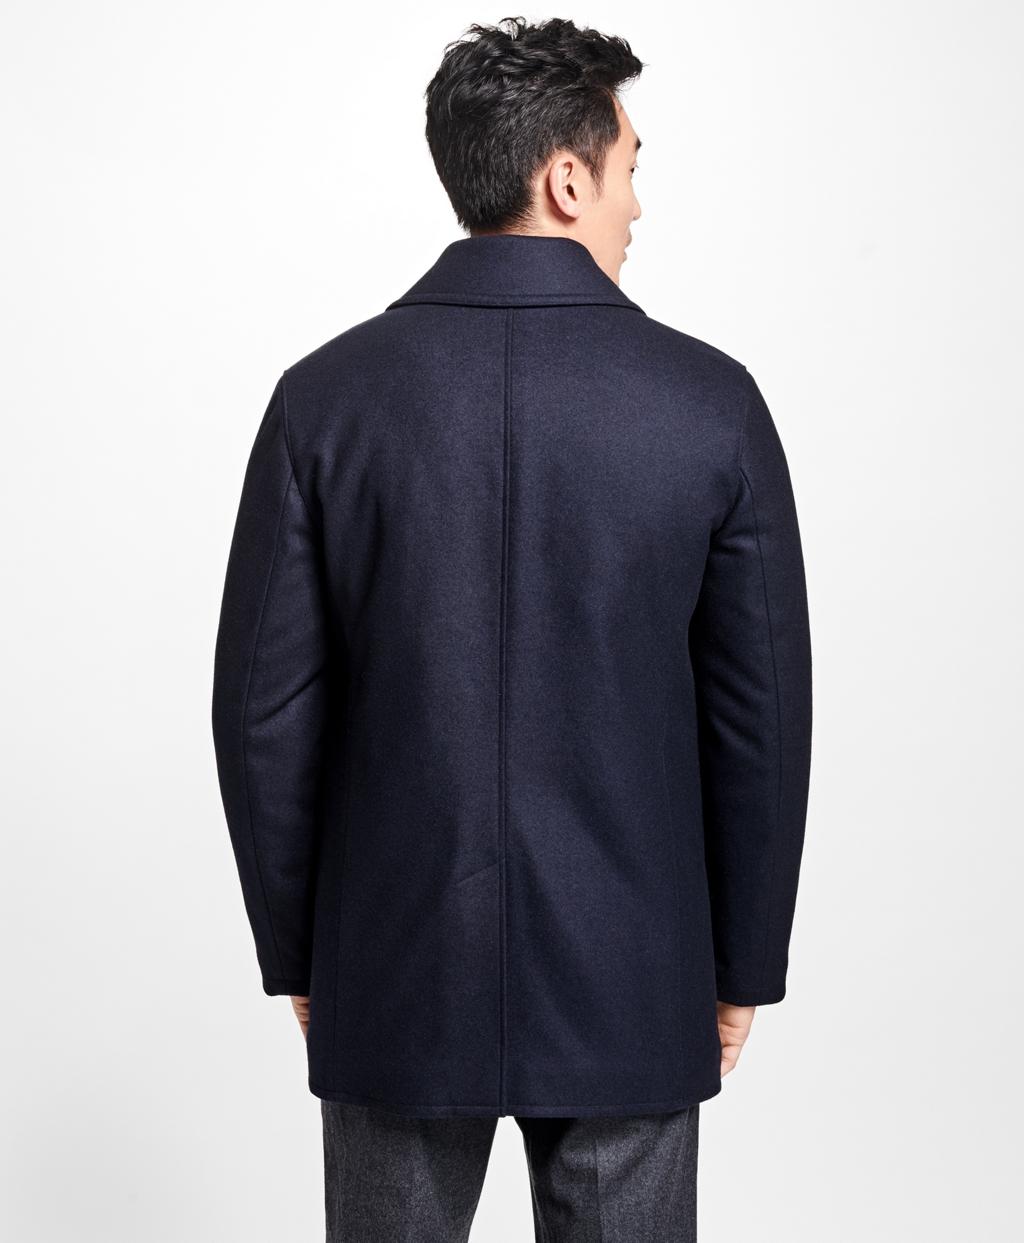 Iconic Wool Pea Coat - Brooks Brothers